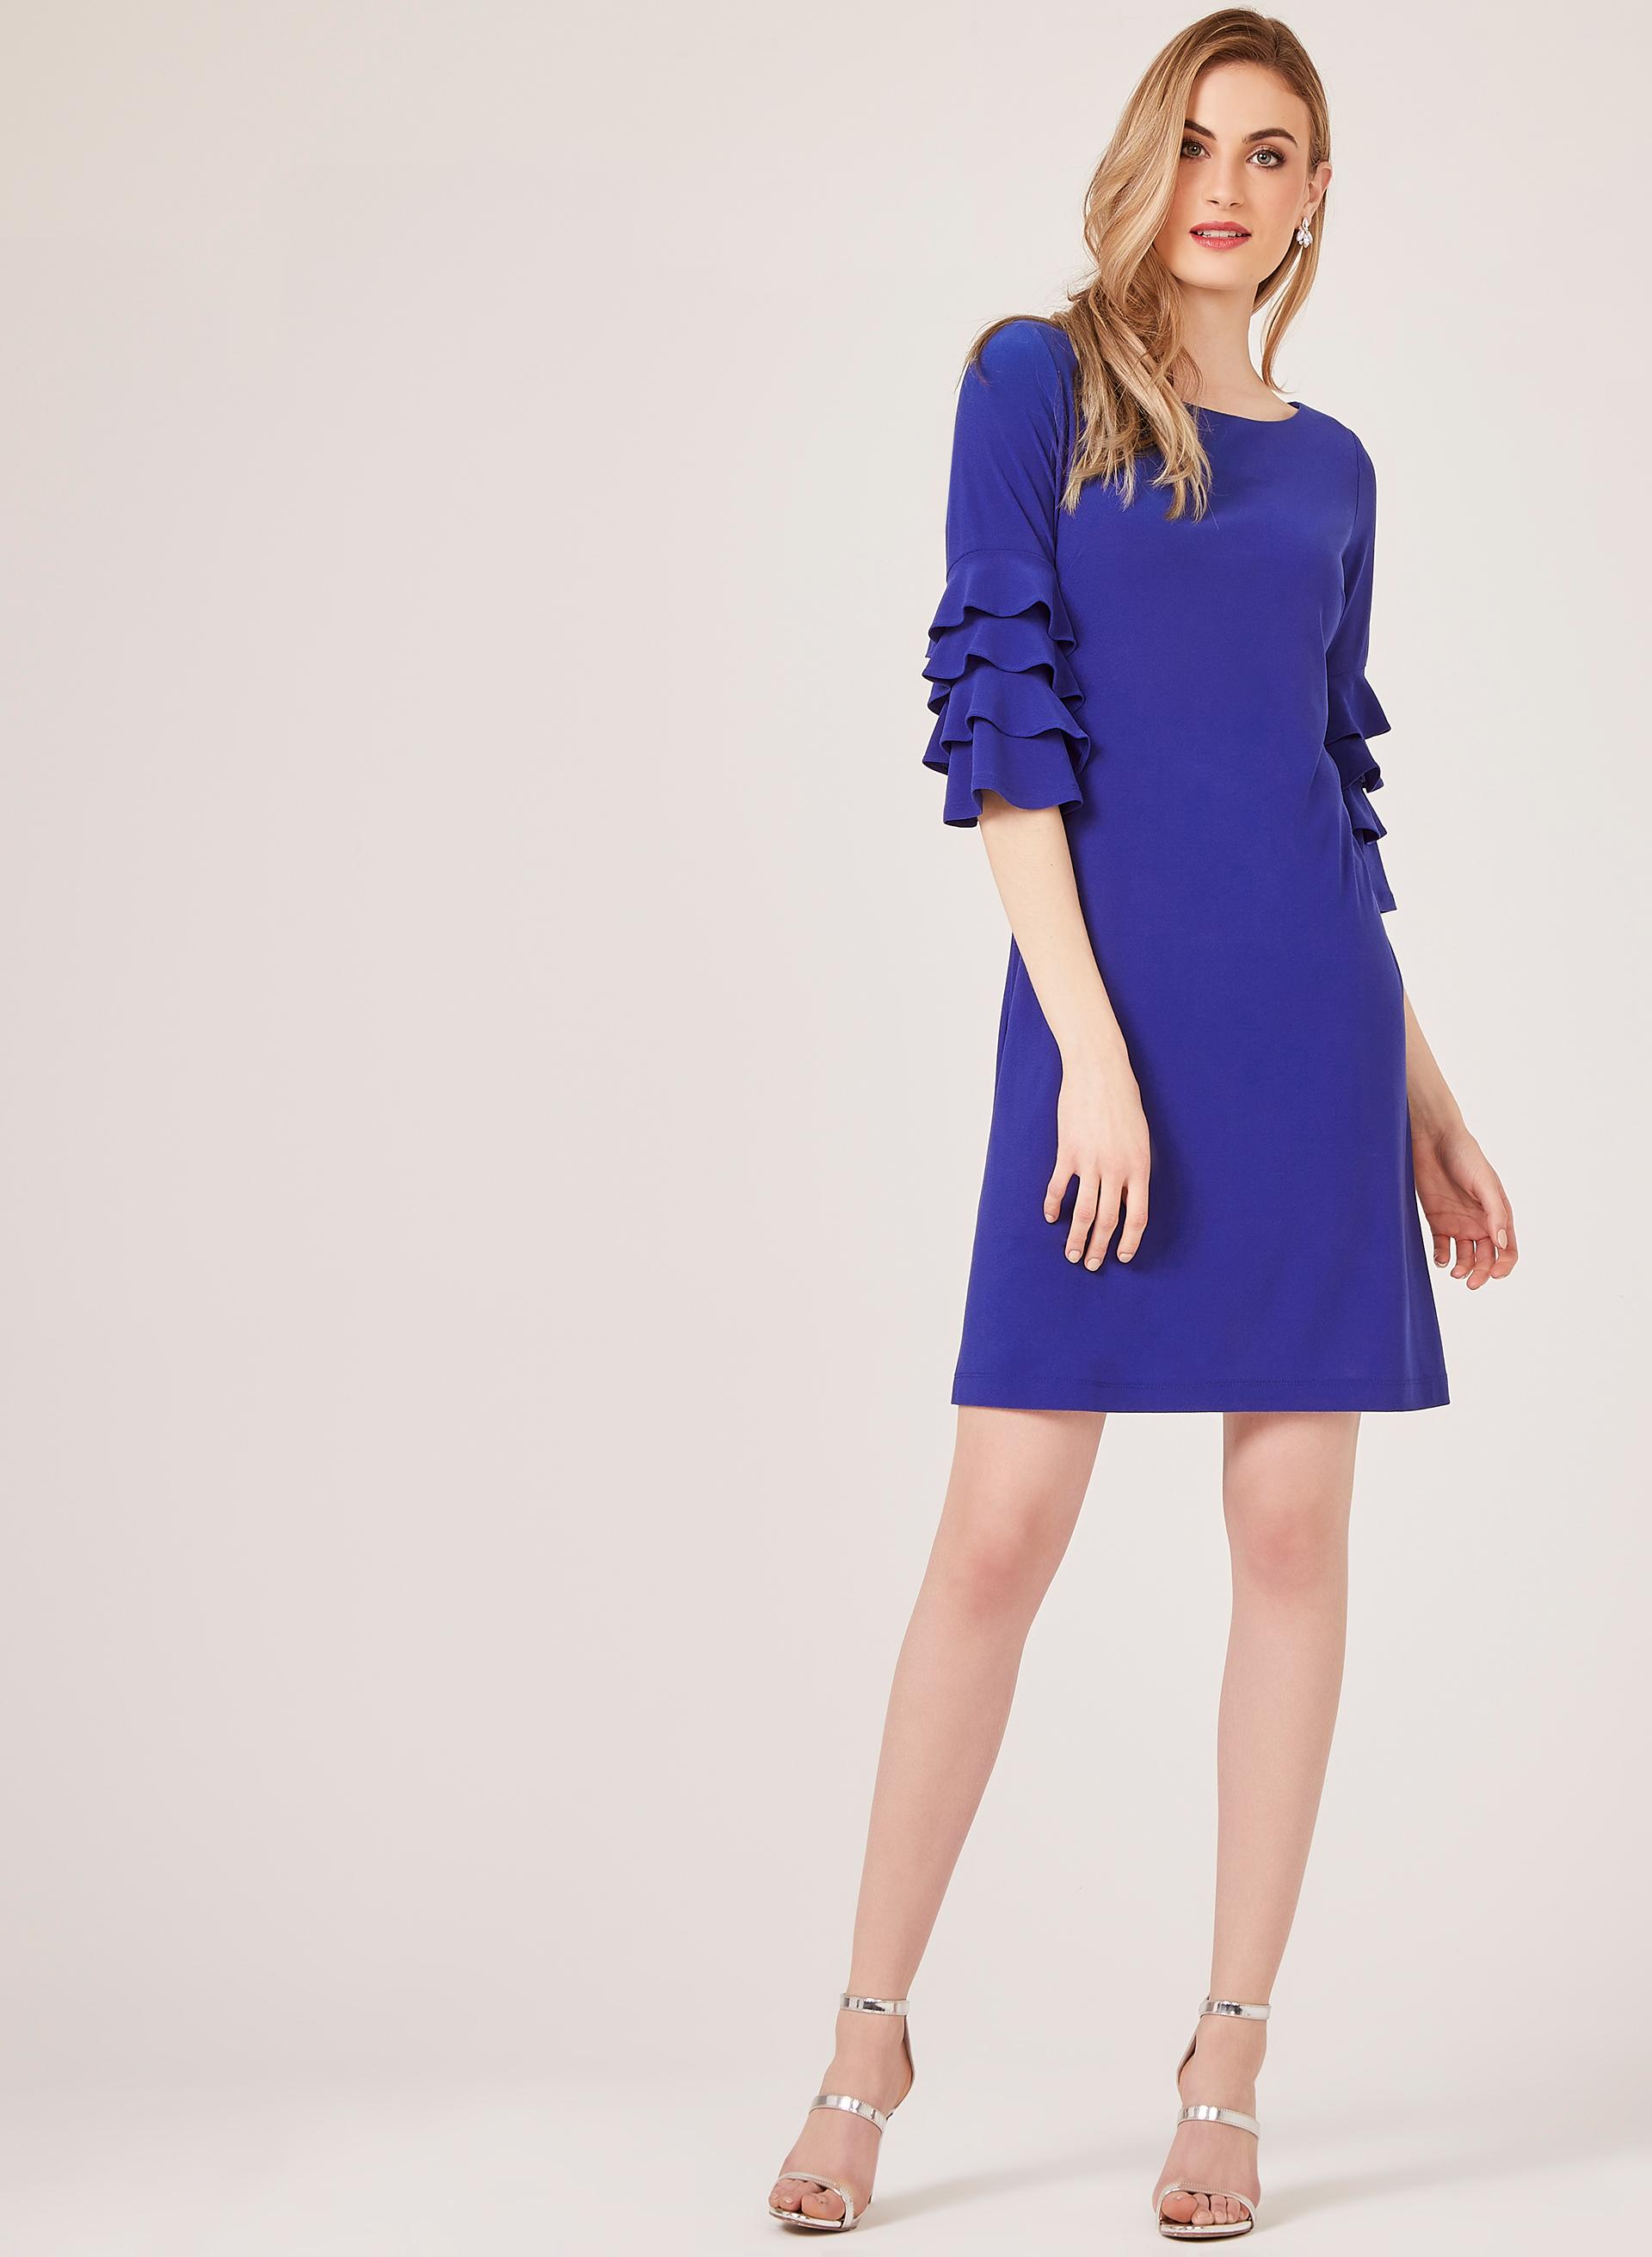 Ruffled Bell Sleeve Crepe Dress